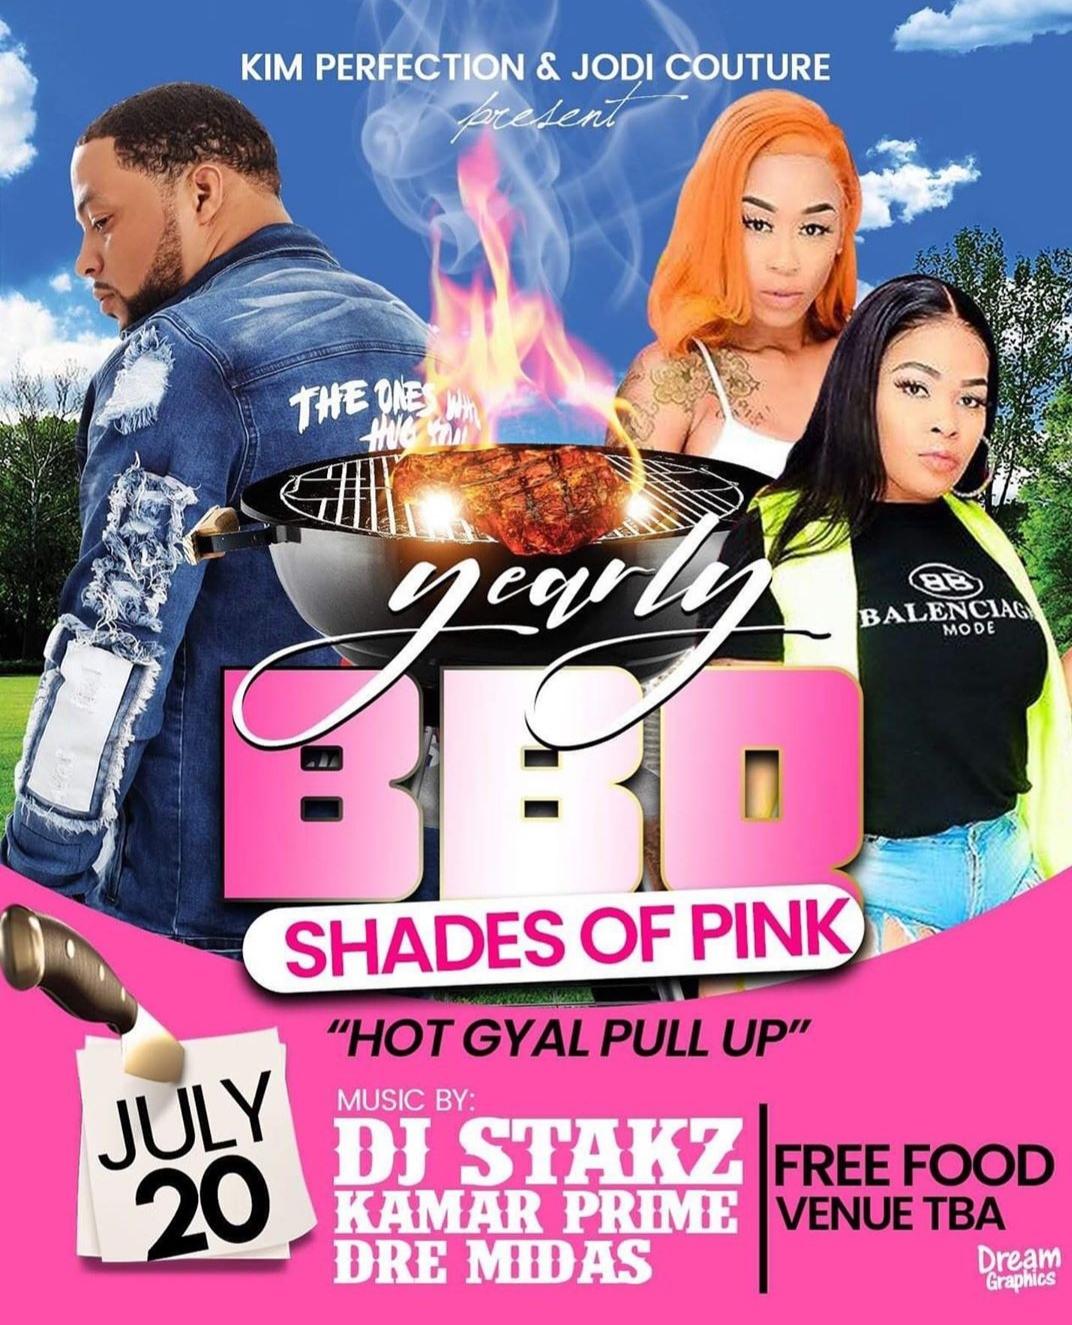 Shades of Pink BBQ - July 20.jpg